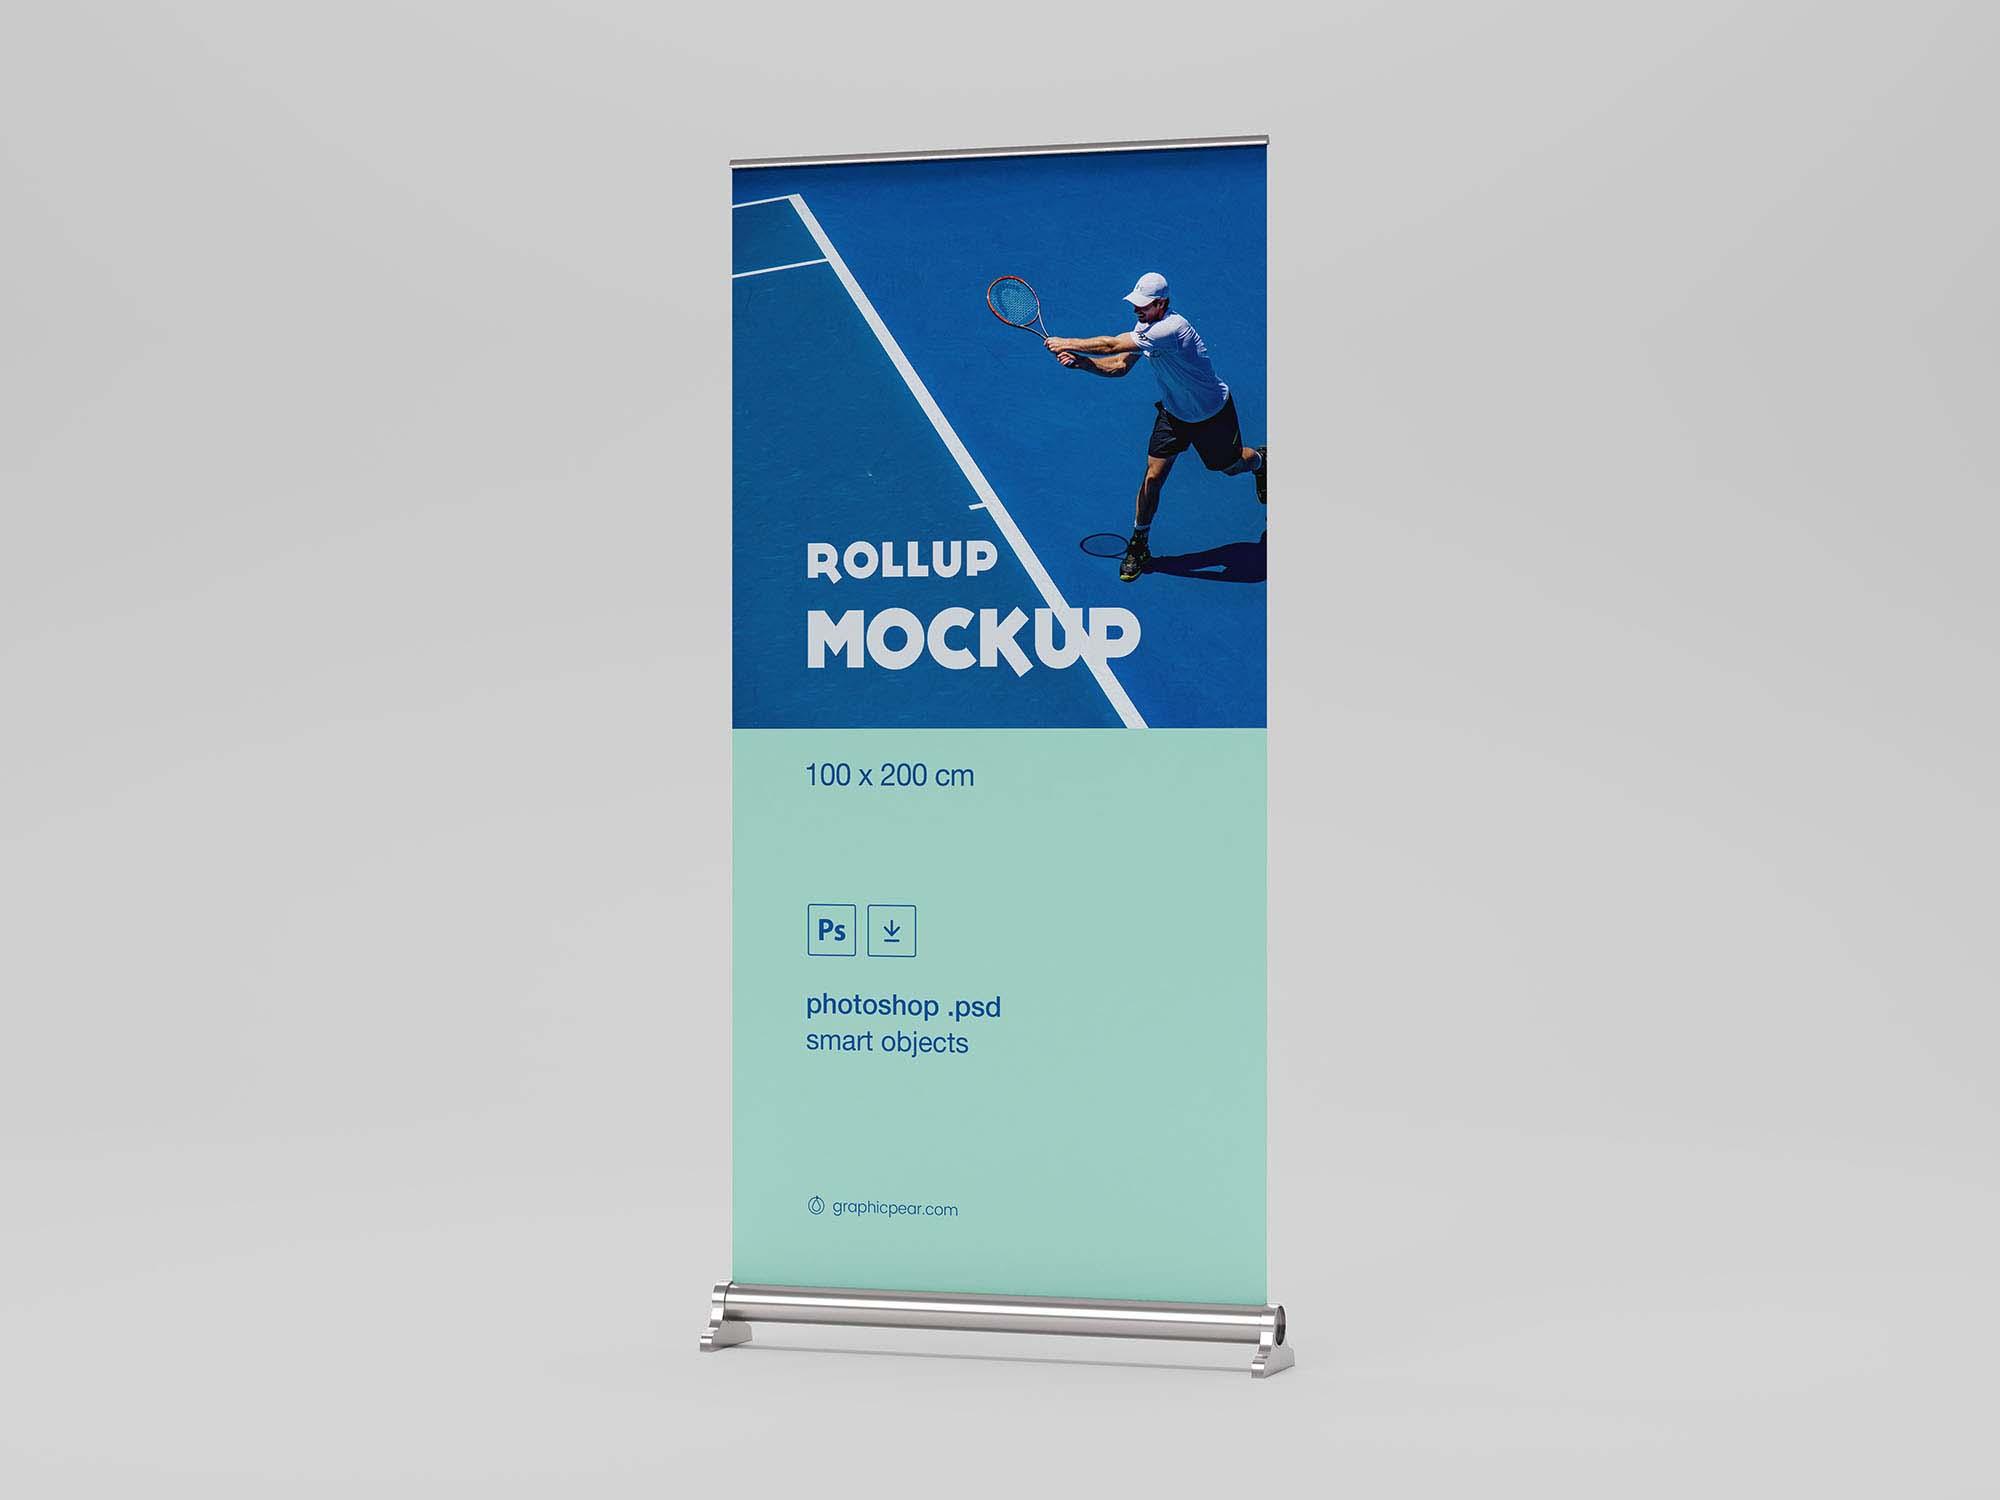 Rollup Mockup (100 x 200)